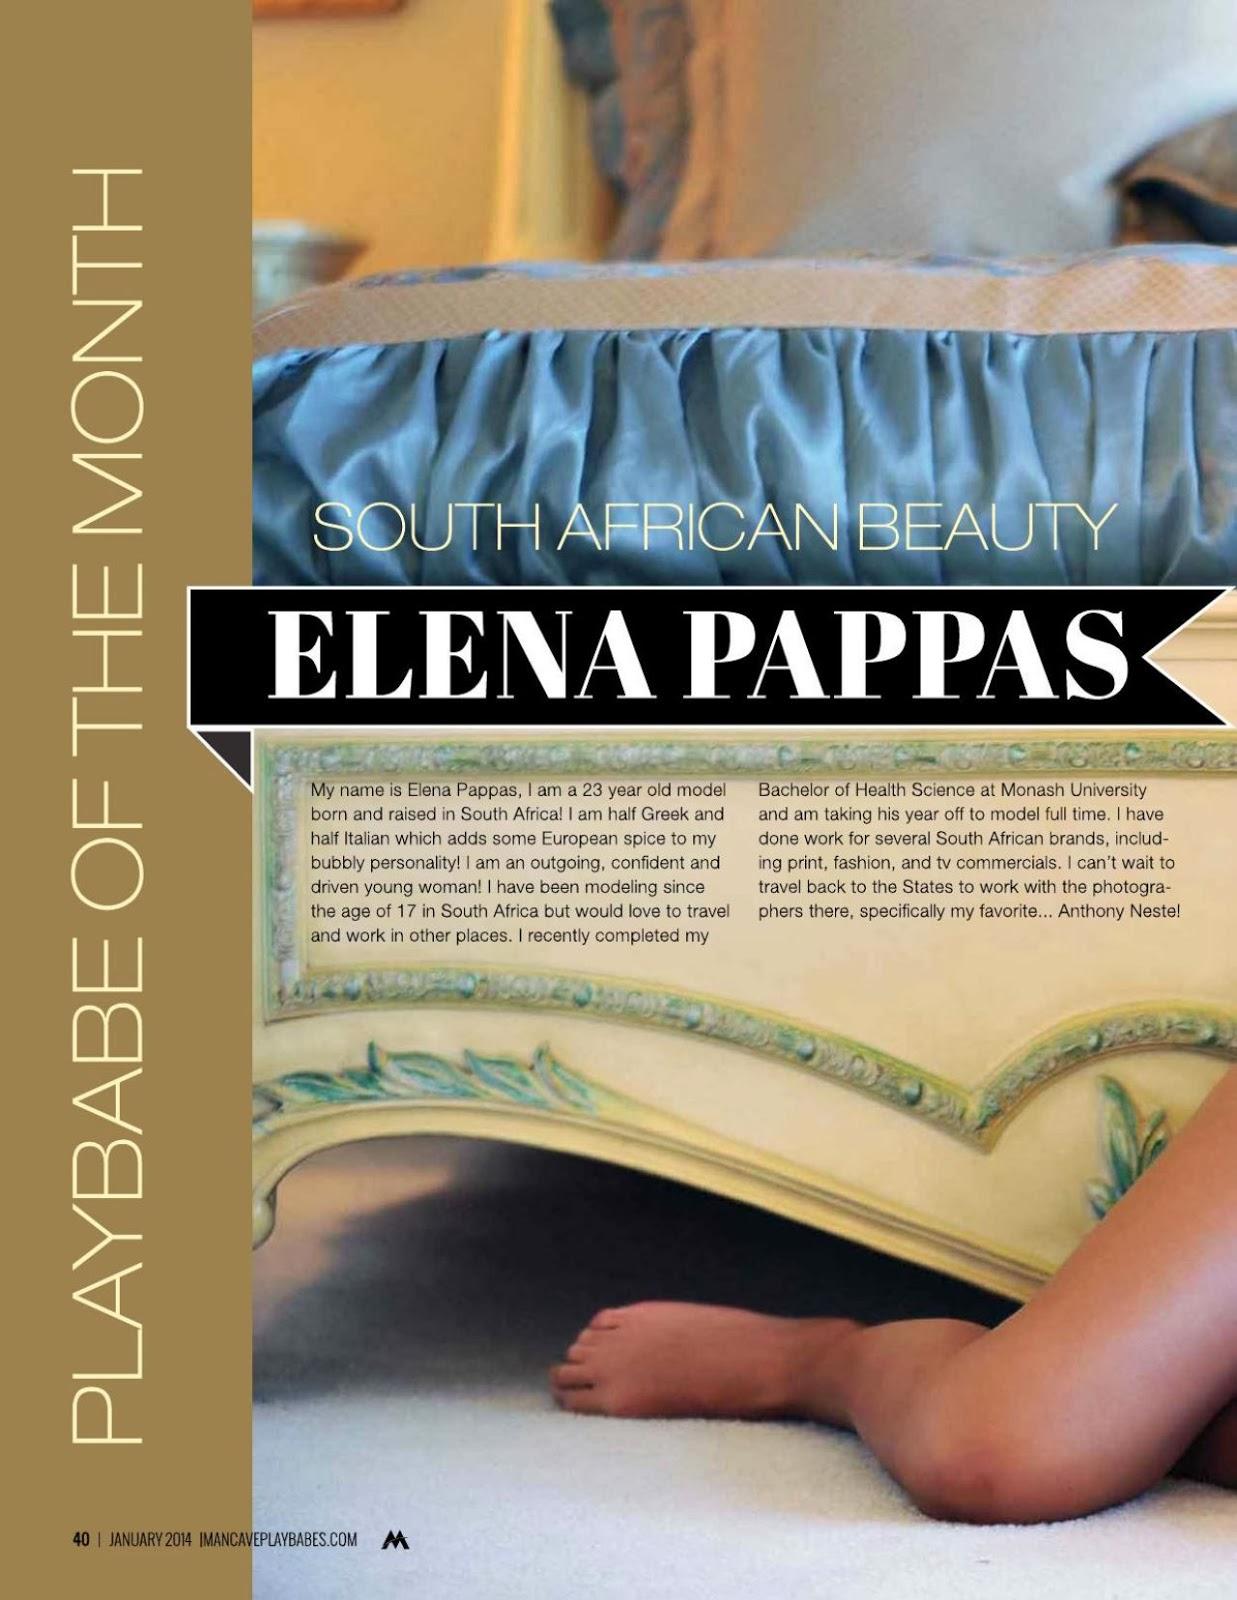 Elena Pappas HQ Pictures Mancave Playbabes Magazine Photoshoot March / April 2014